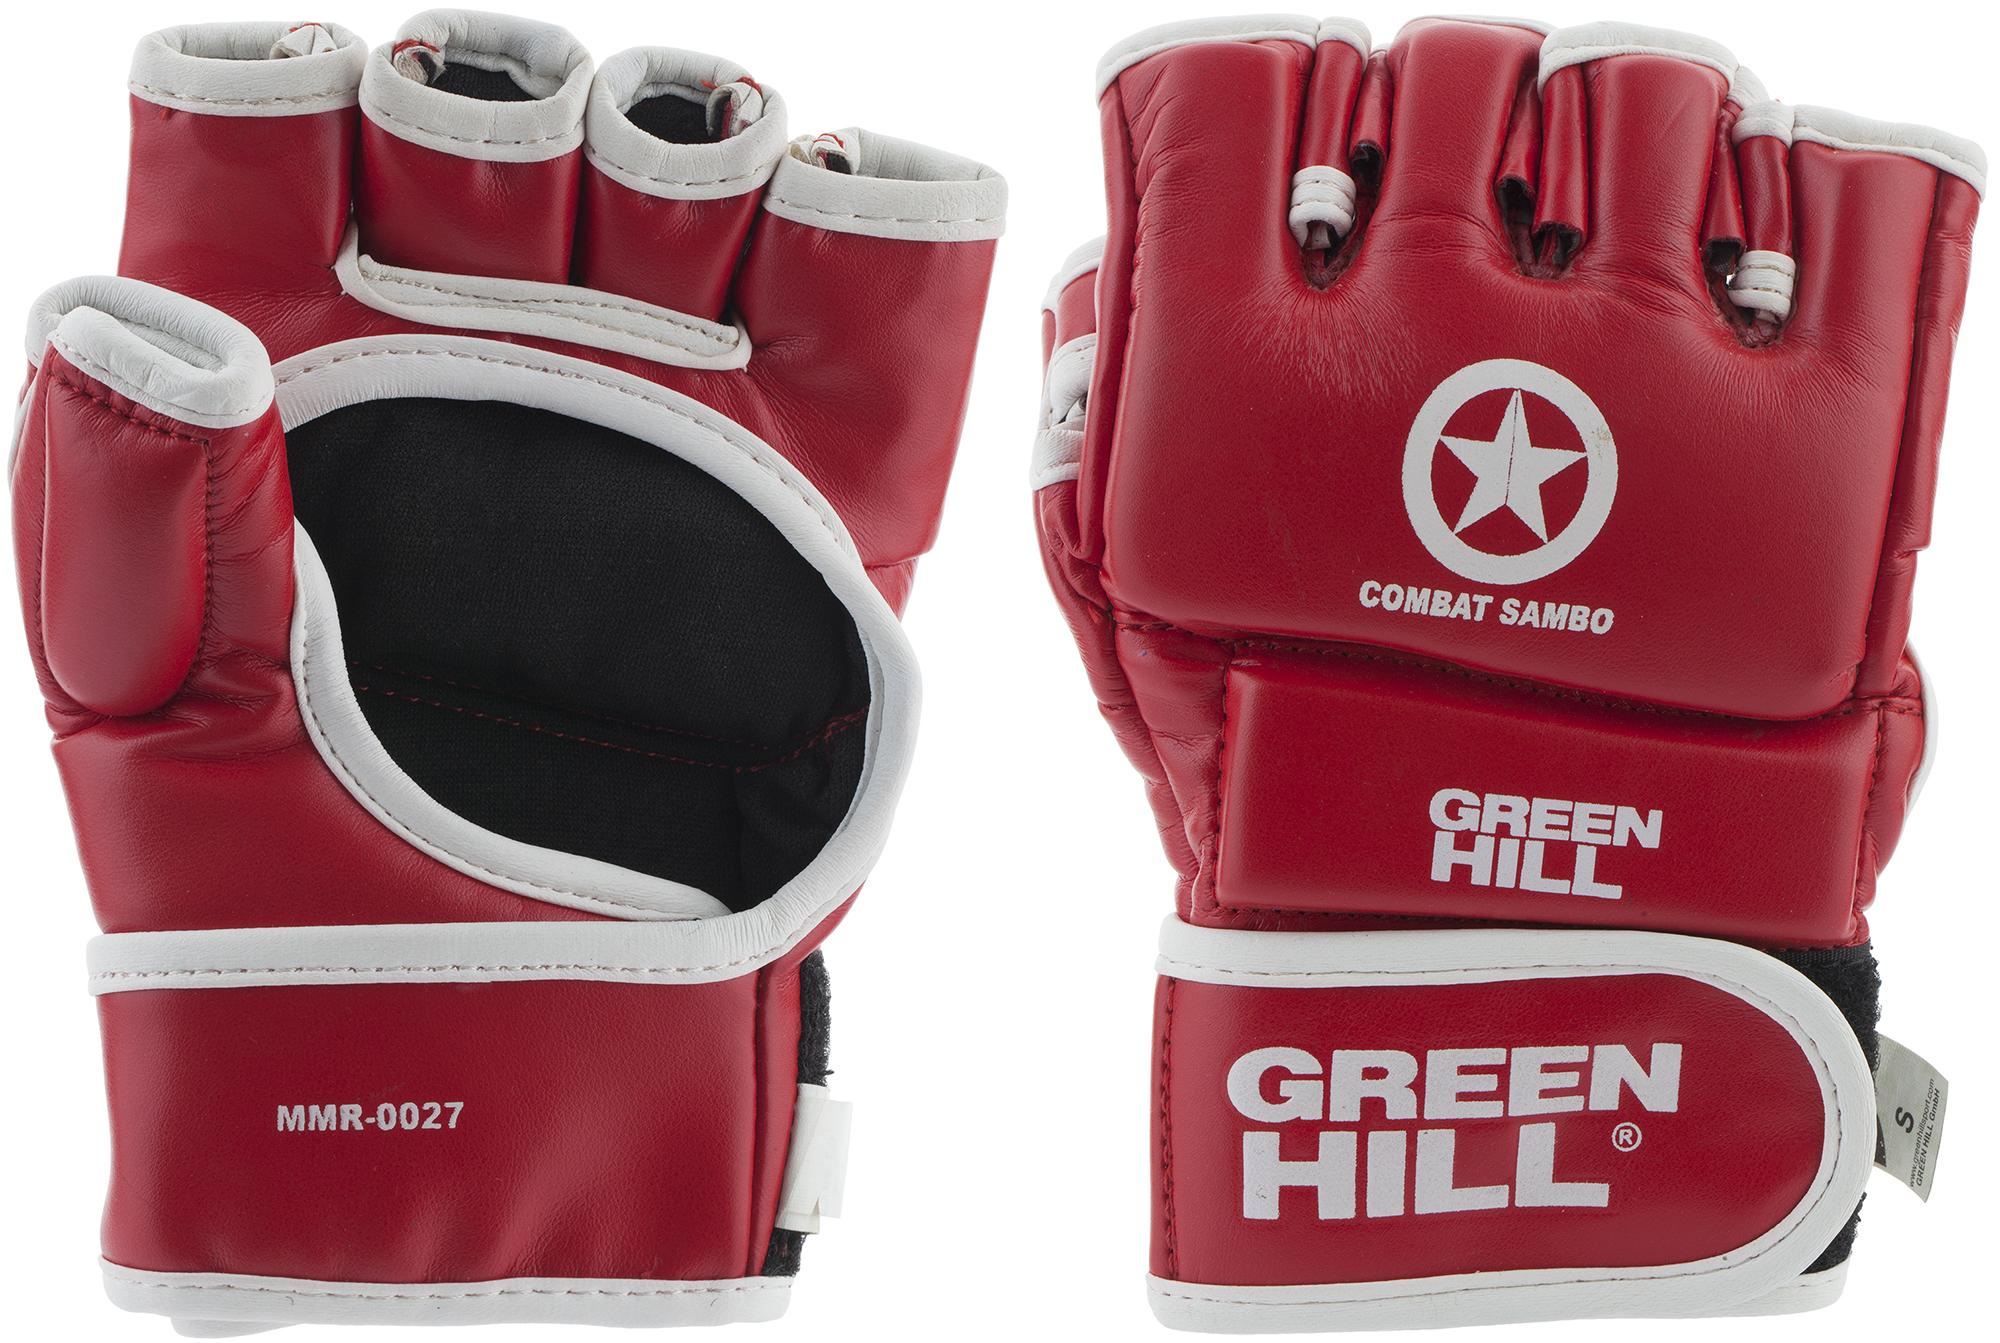 Green Hill Перчатки Green Hill Combat Sambo, размер 14 oz